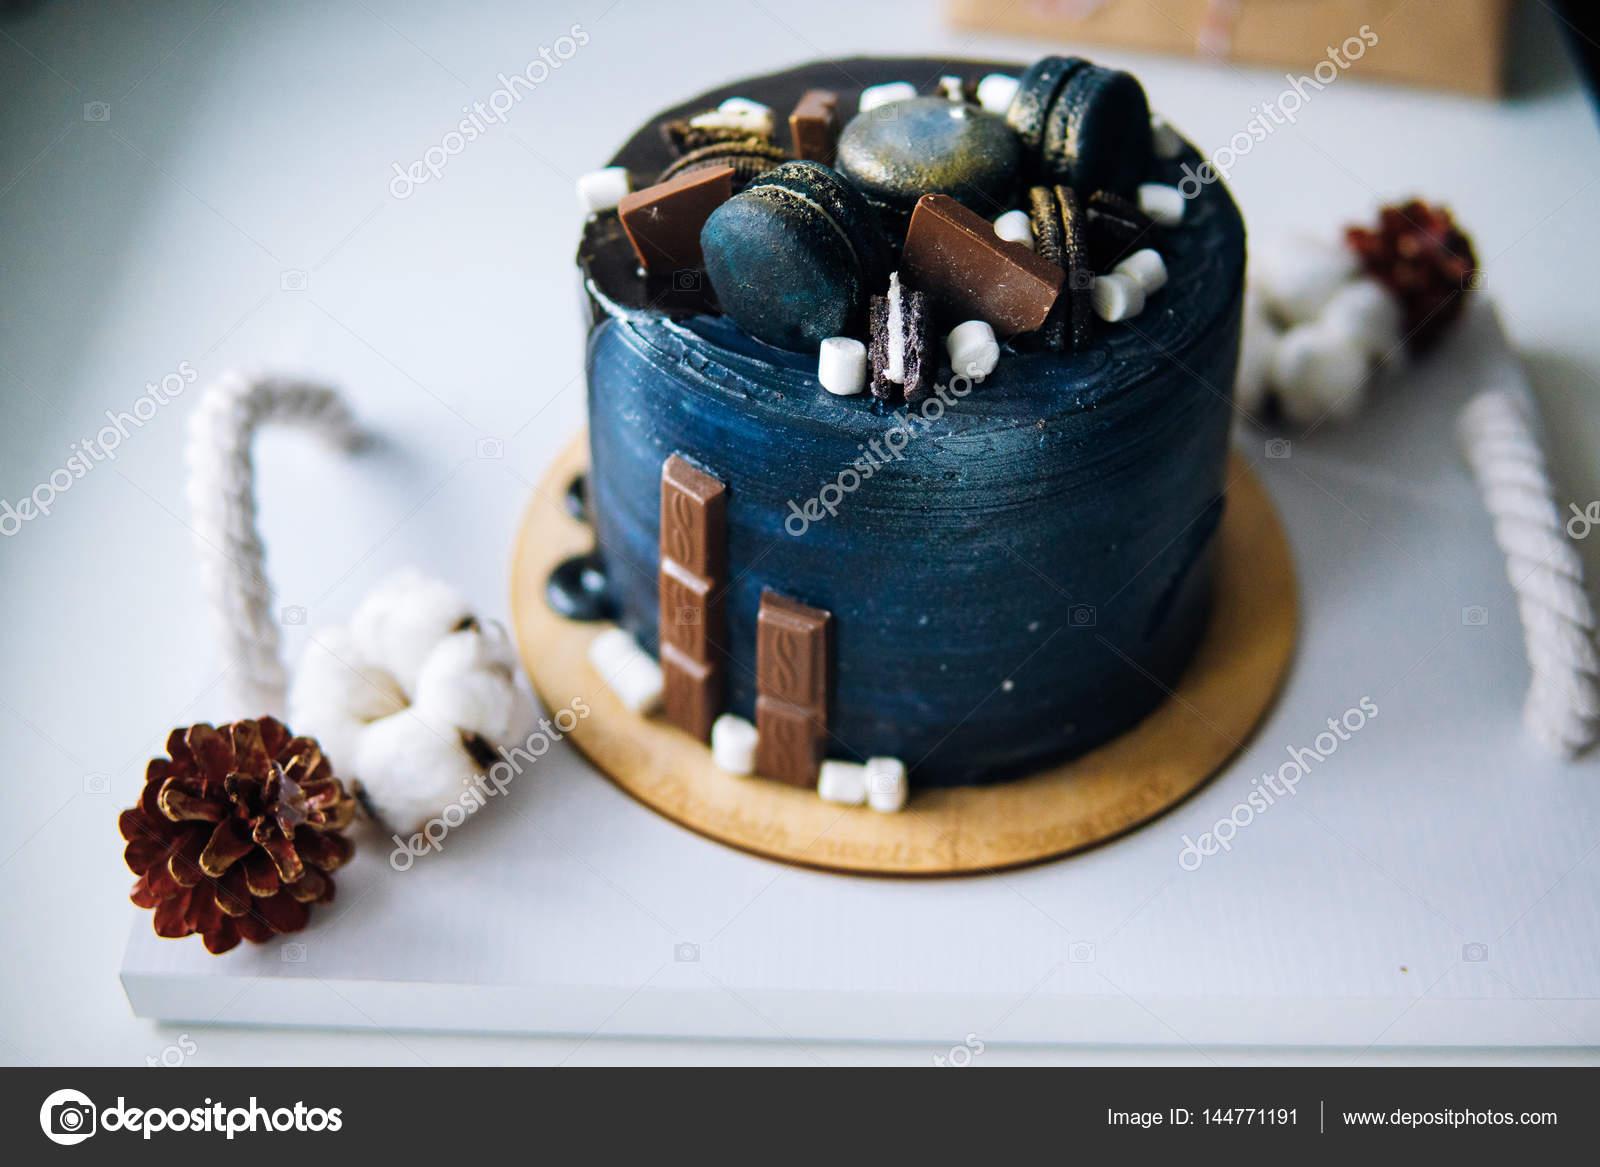 Beautiful Designer Chocolate Cake Stock Photo C Simbiothy 144771191